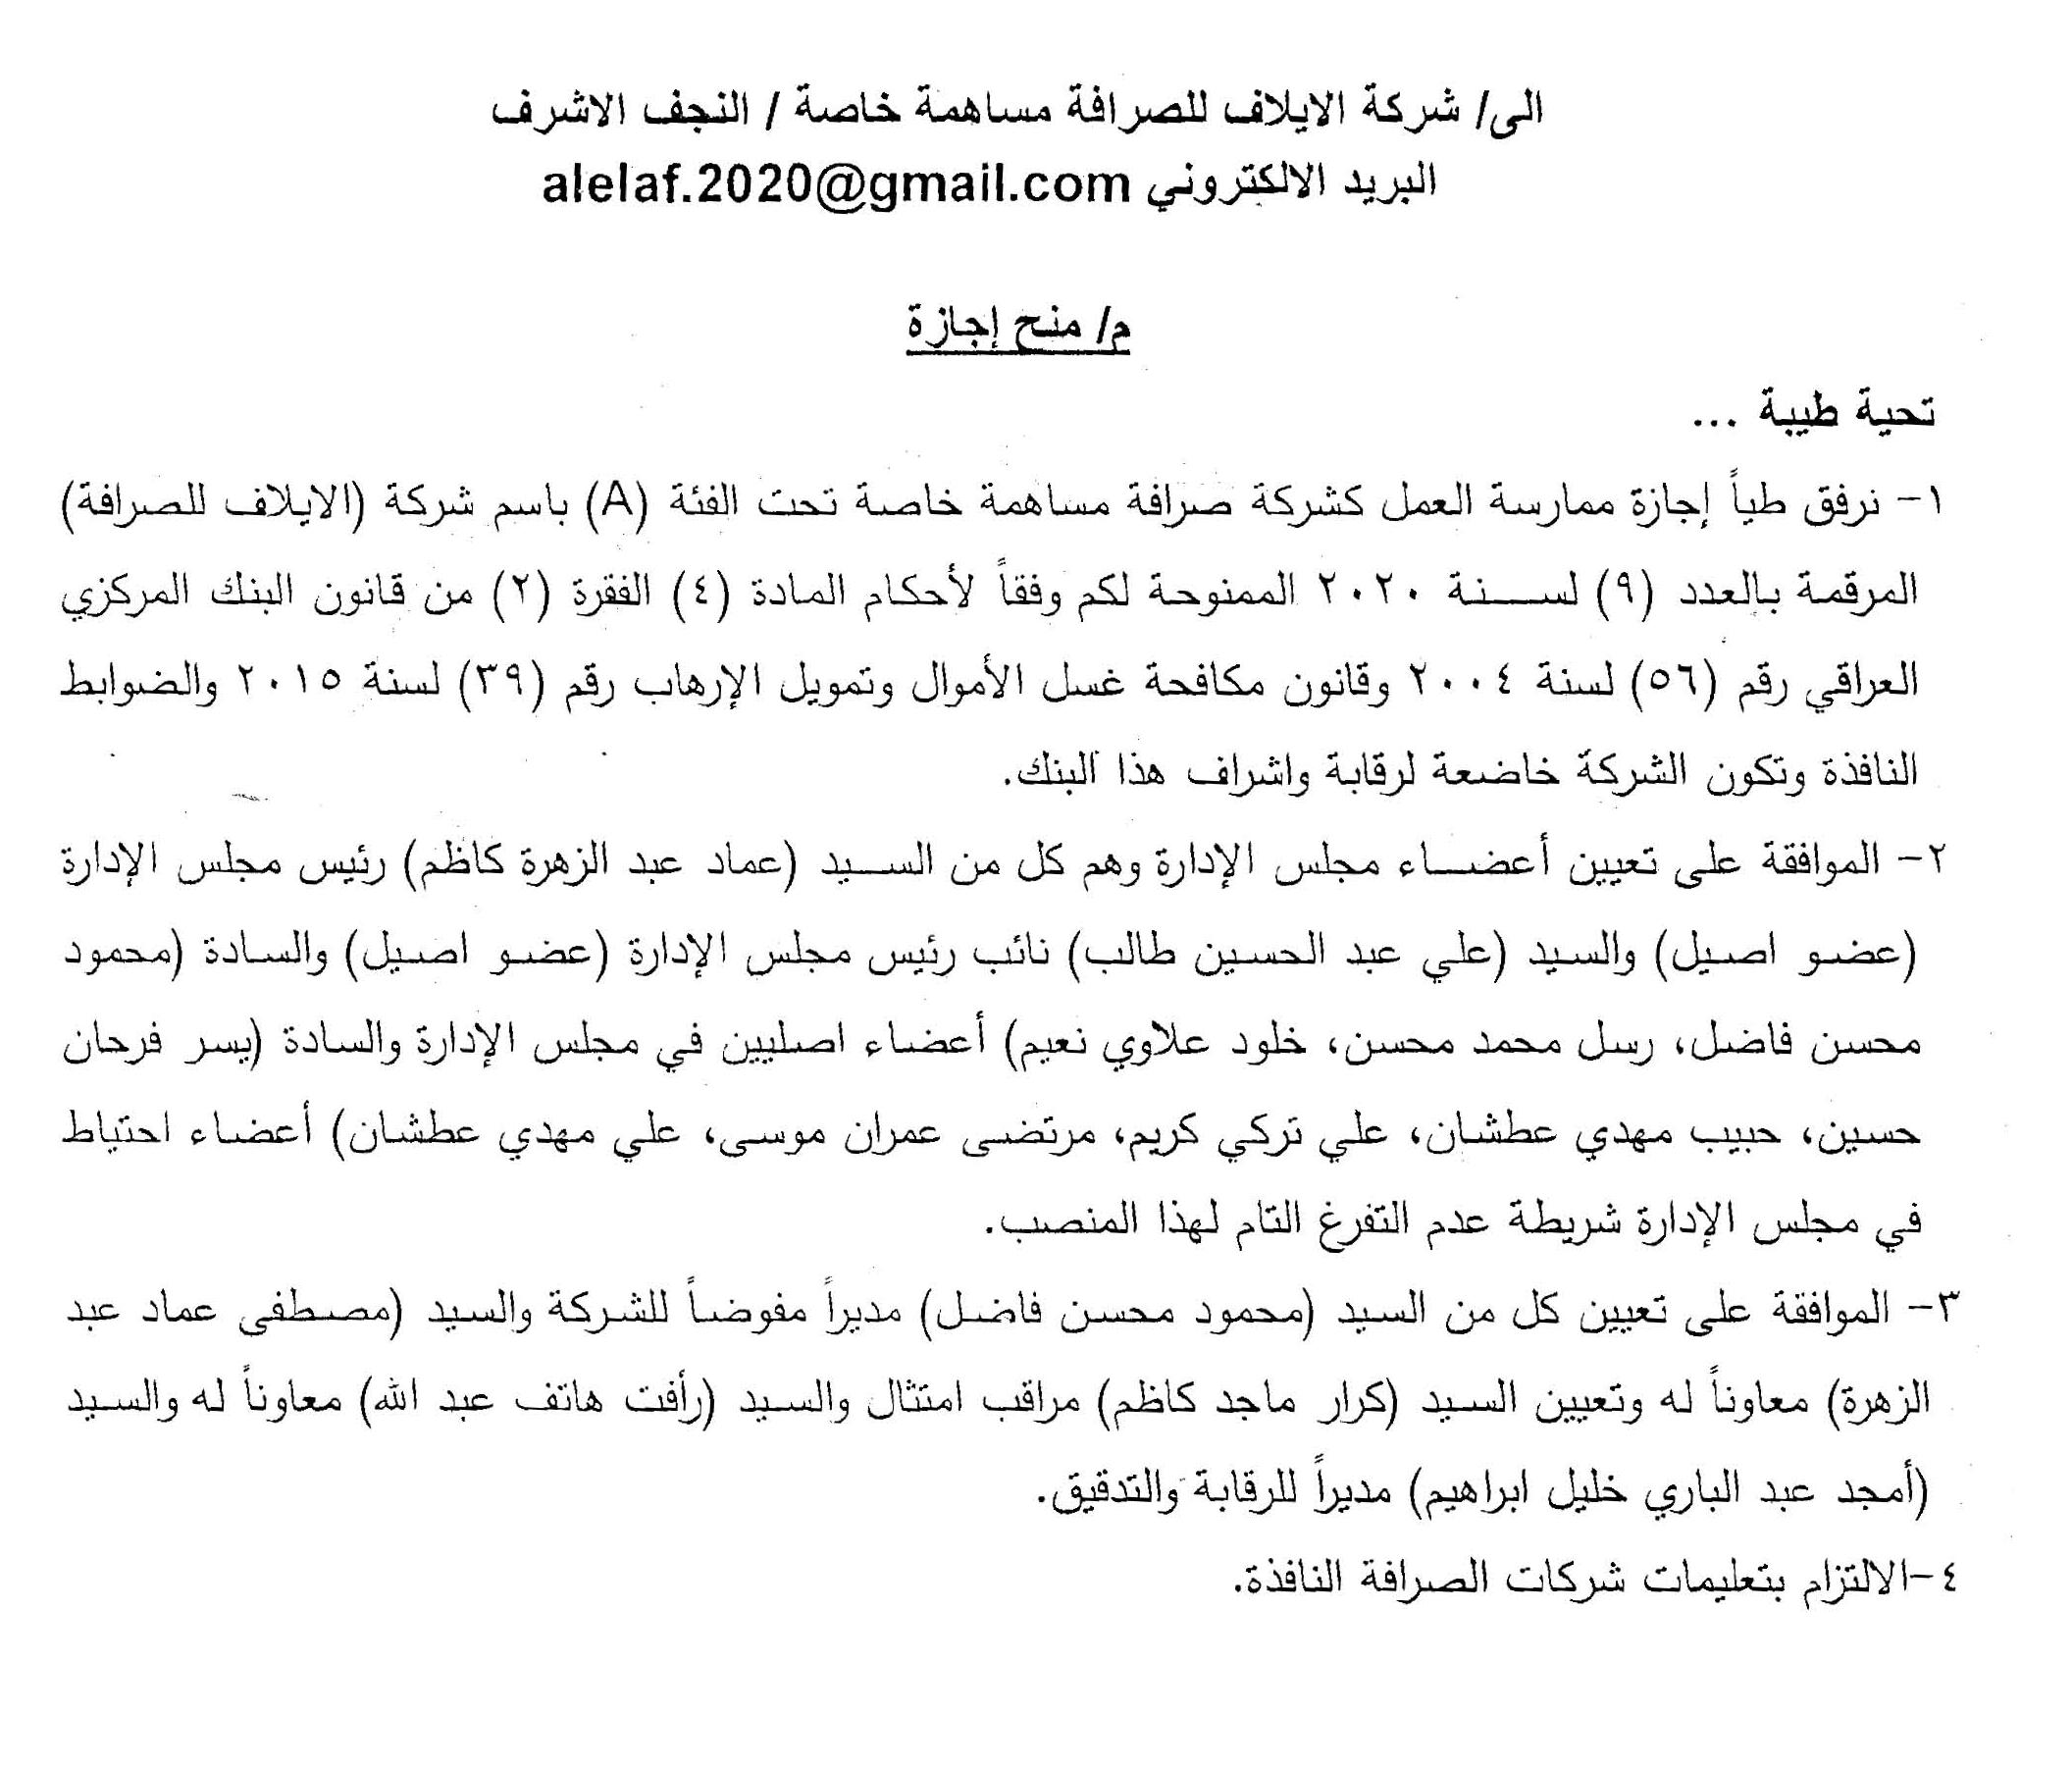 Grant a license to Al-Taif Exchange Company File-159463669327540